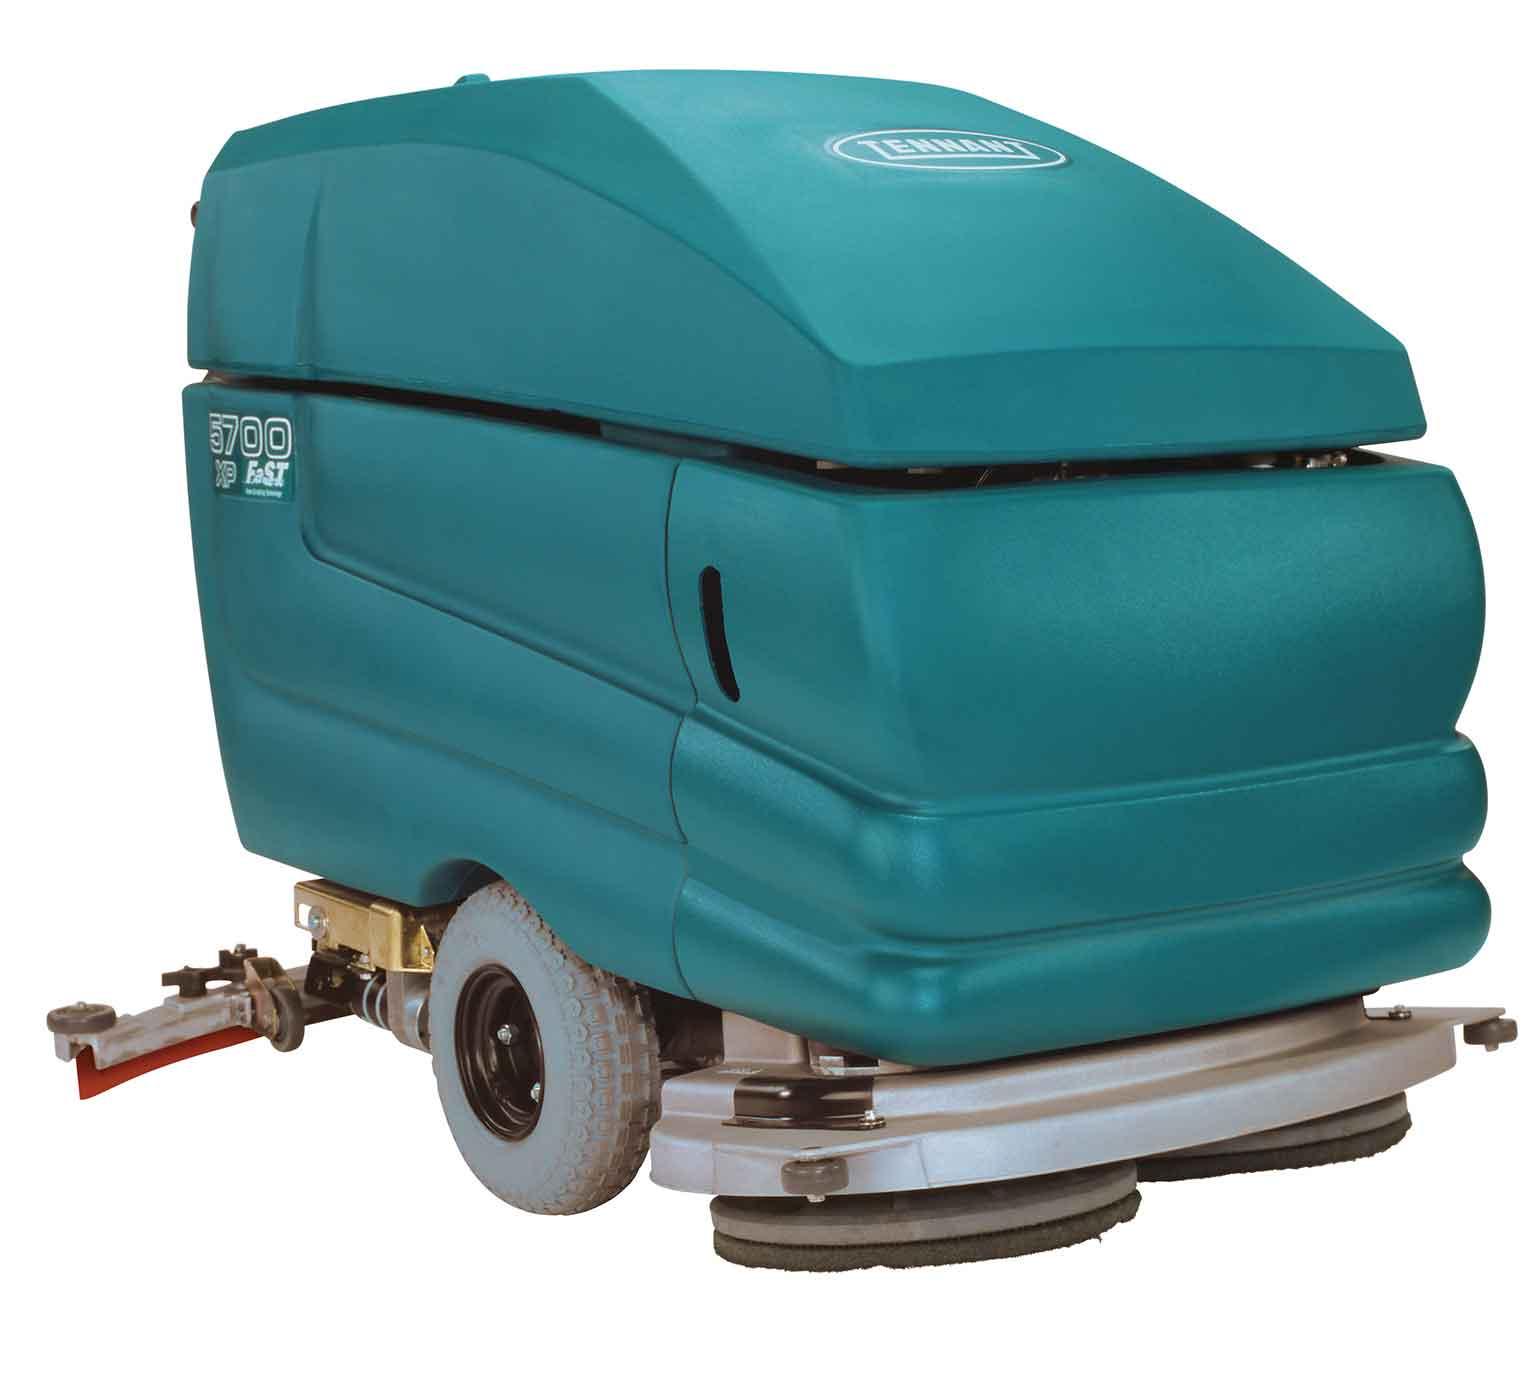 5700 Industrial Strength Floor Scrubber Tennant Company